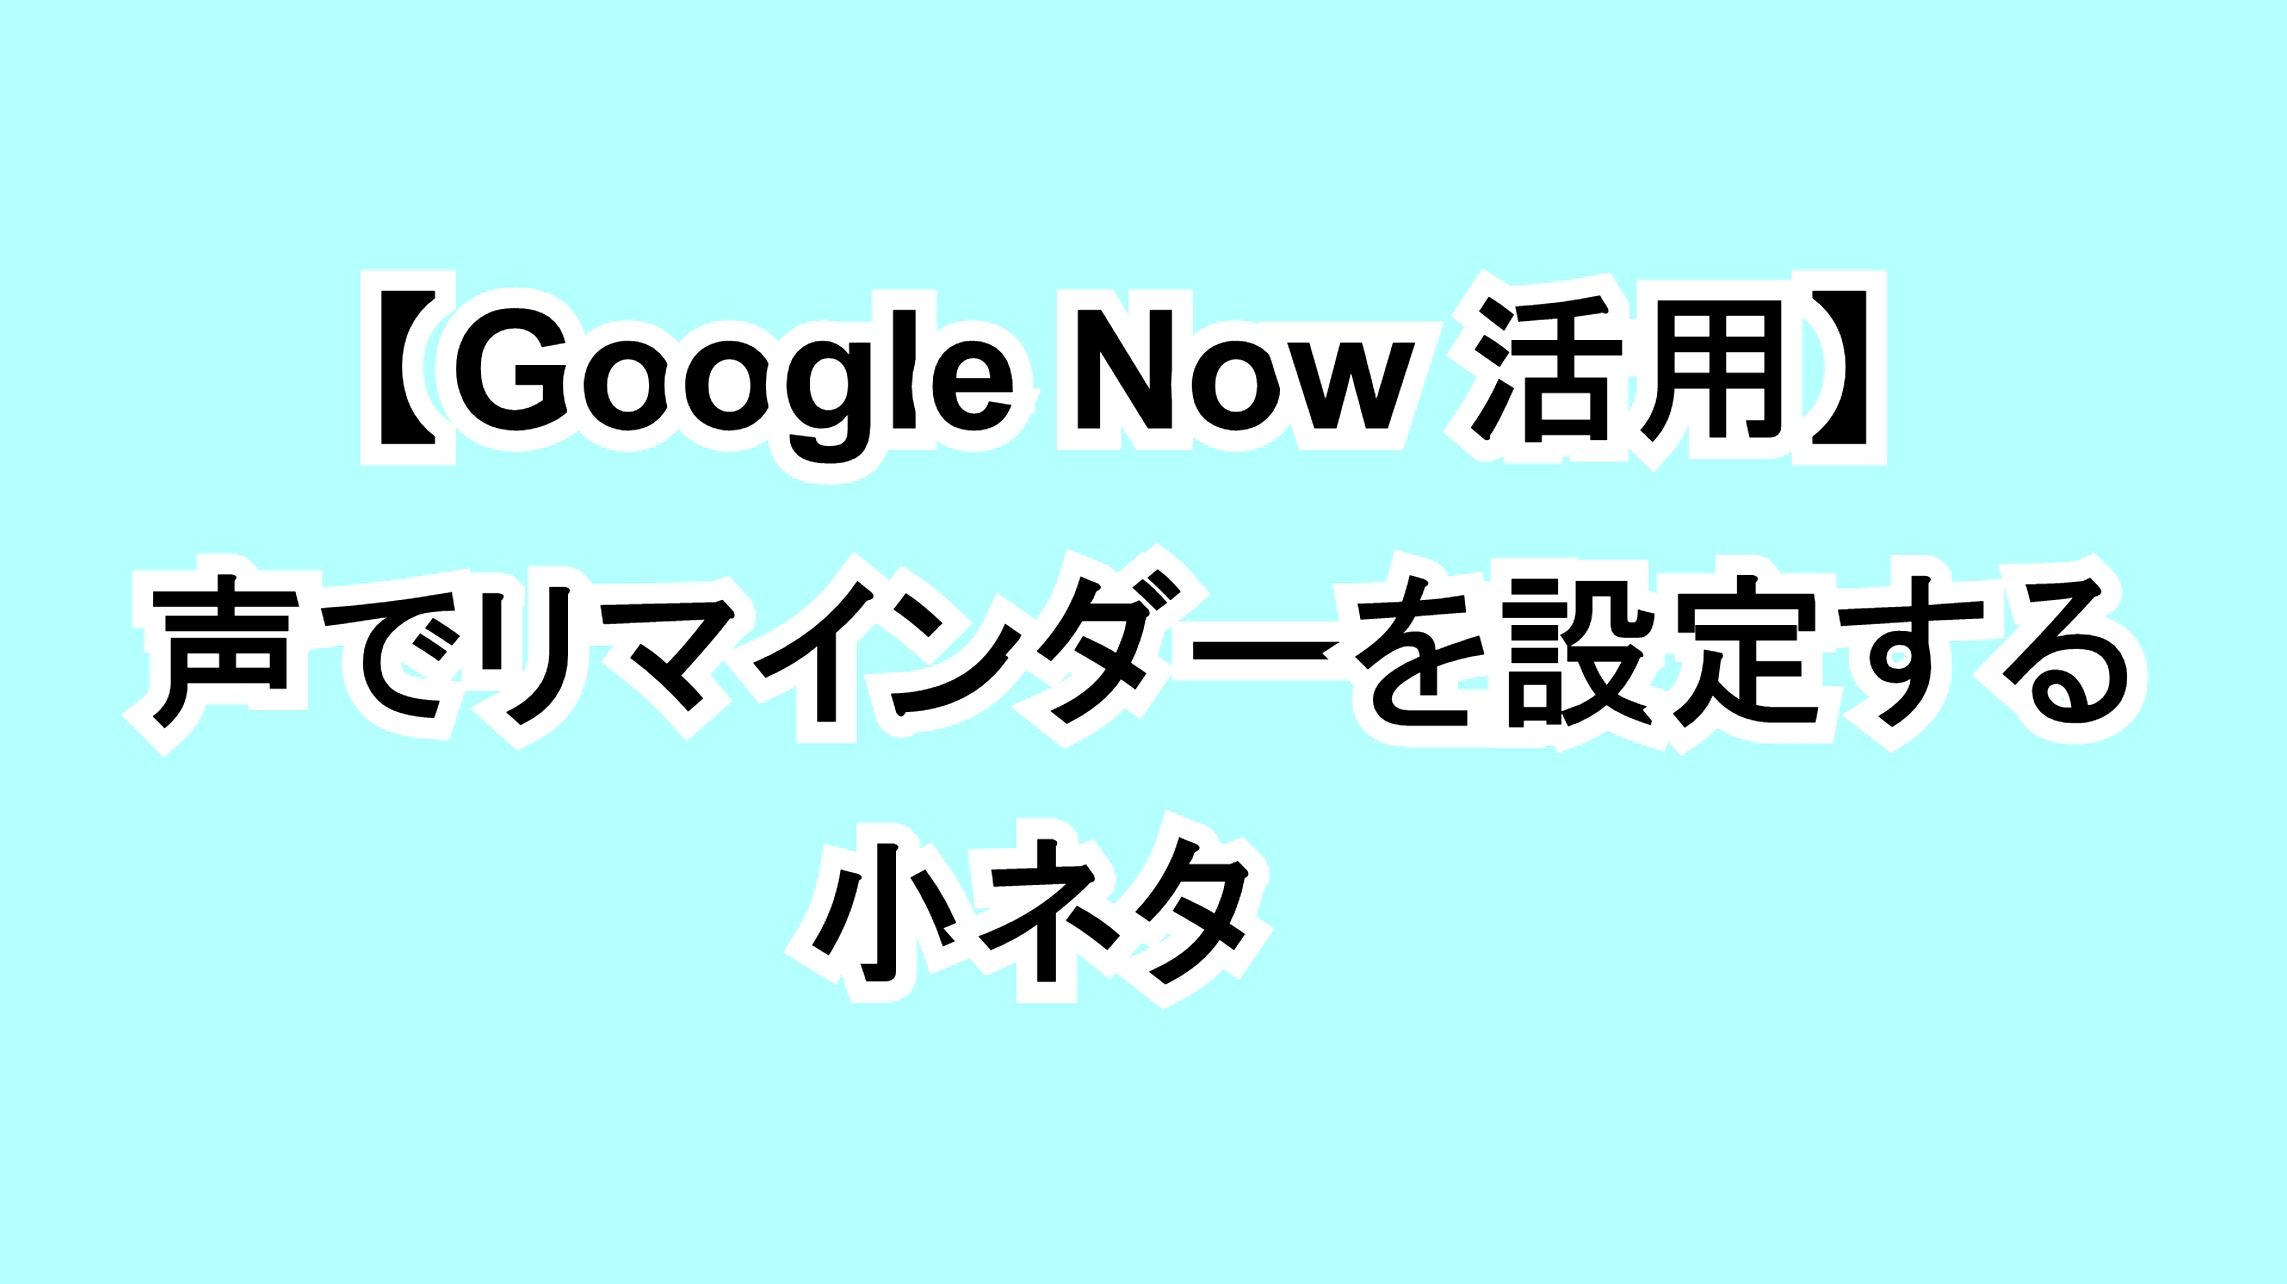 【Google Now活用】声でリマインダーを設定する小ネタ